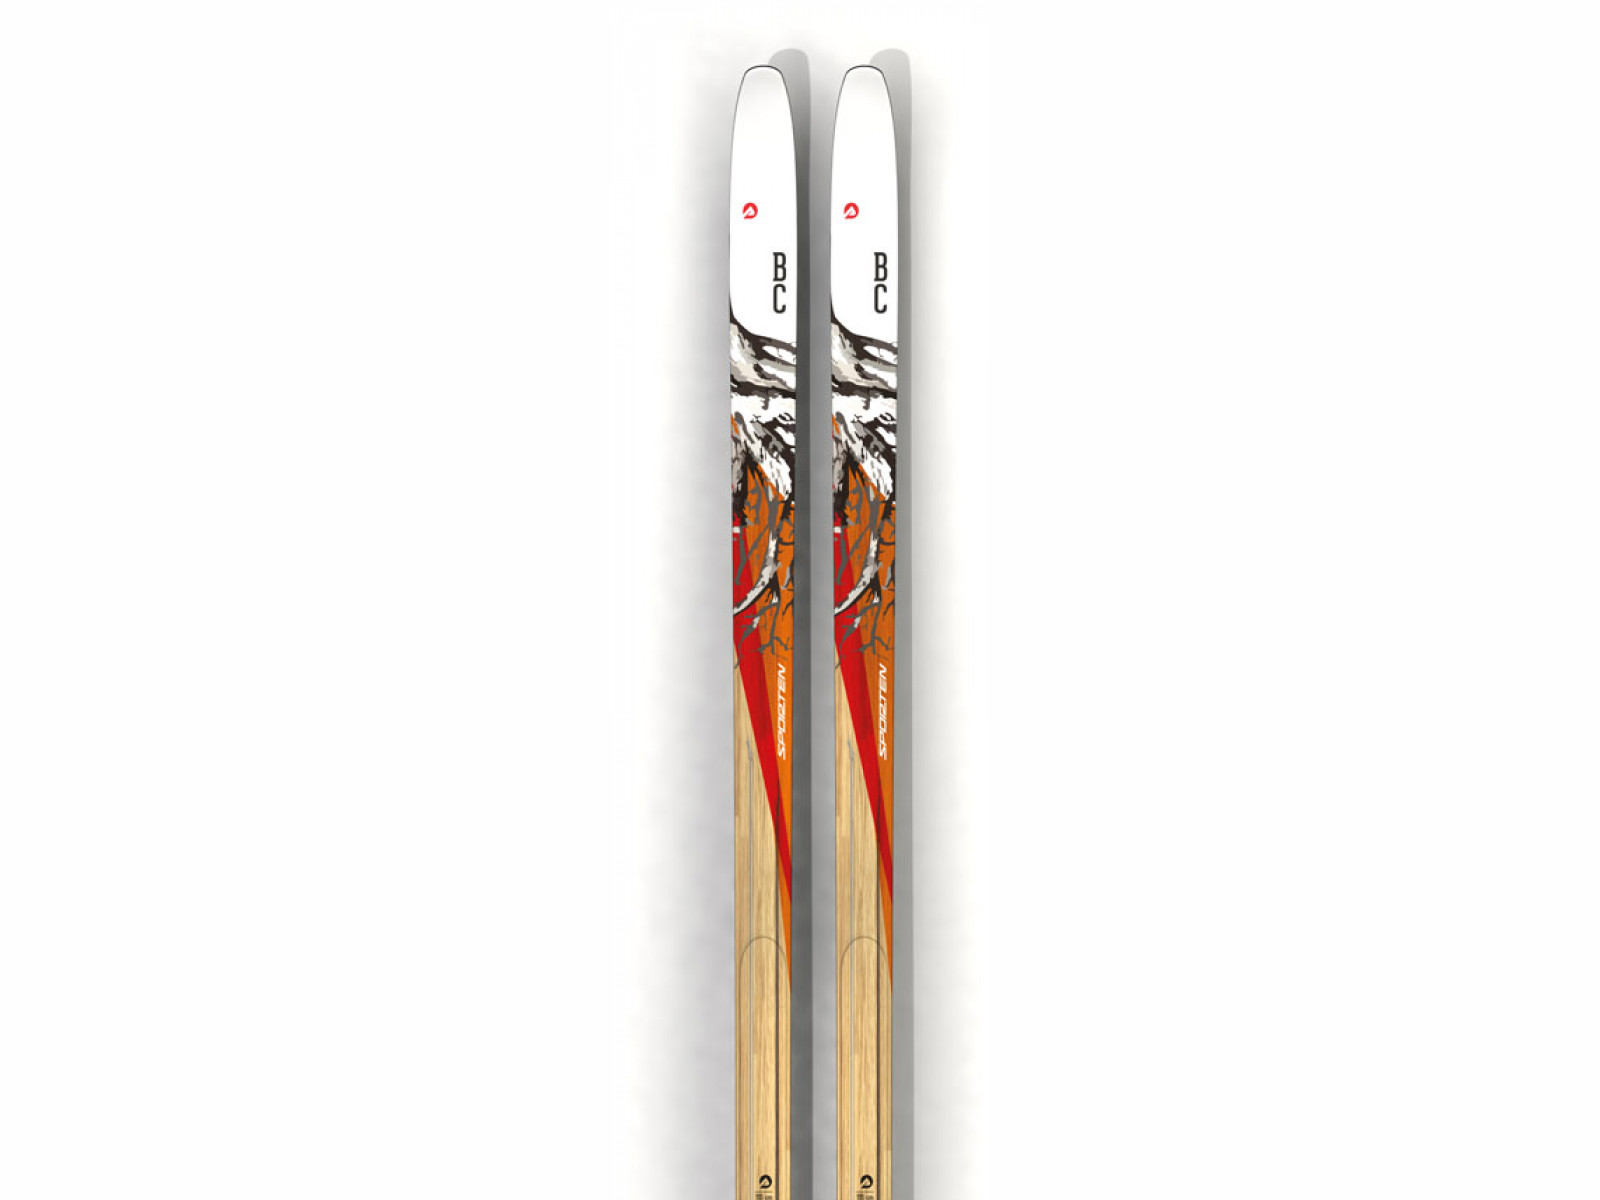 Sporten Explorer Skin Délka: 165 cm 2019/2020